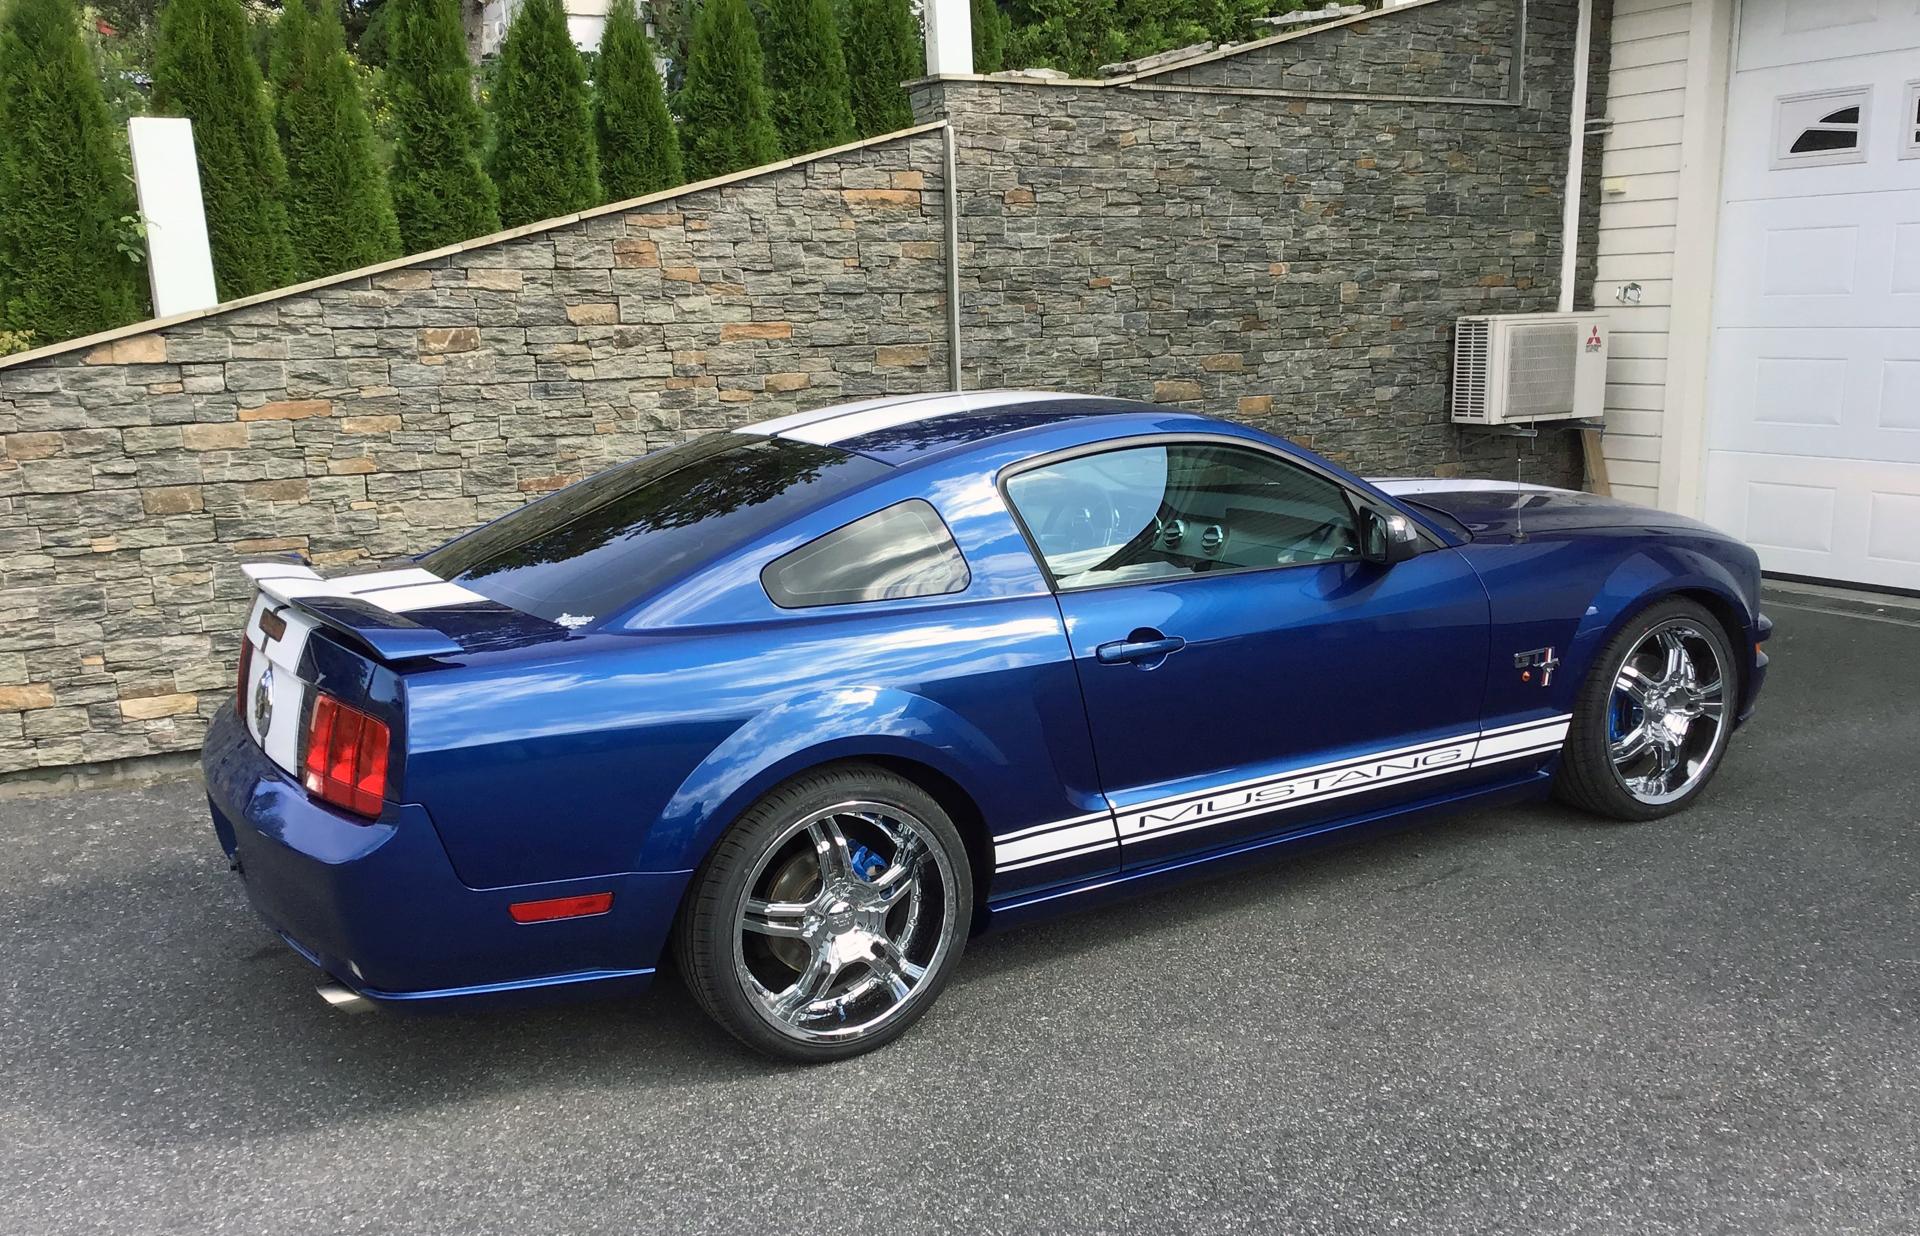 090-2007 Ford Mustang GT 02. Eier- medlem 090 Robe